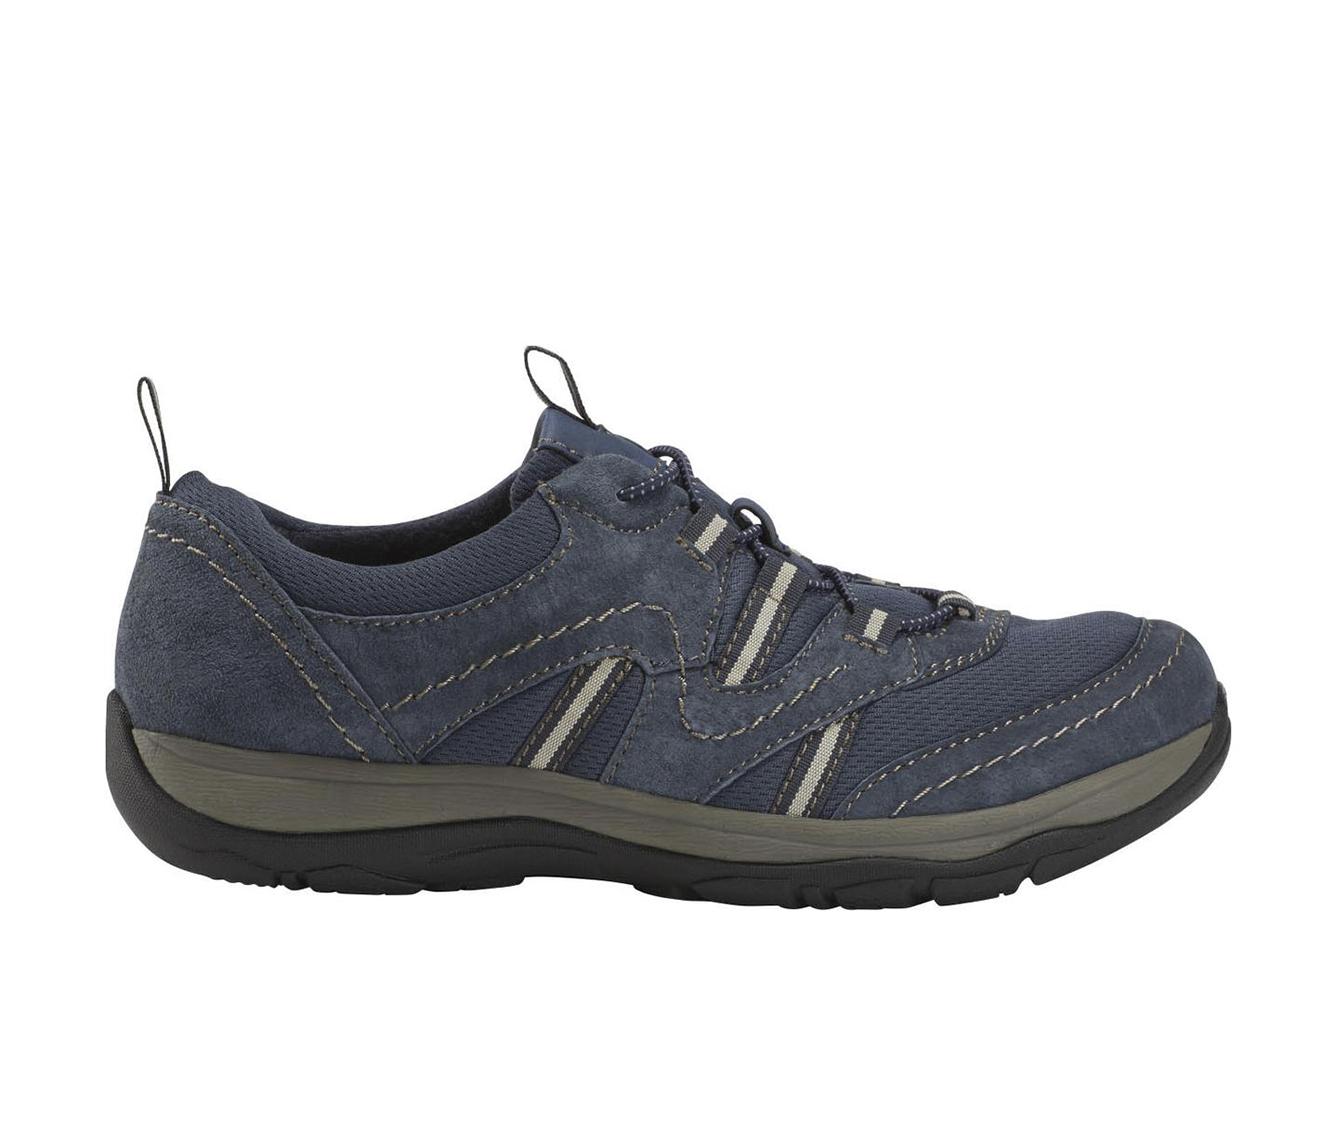 Earth Origins Luci Landon Women's Shoe (Blue Suede)